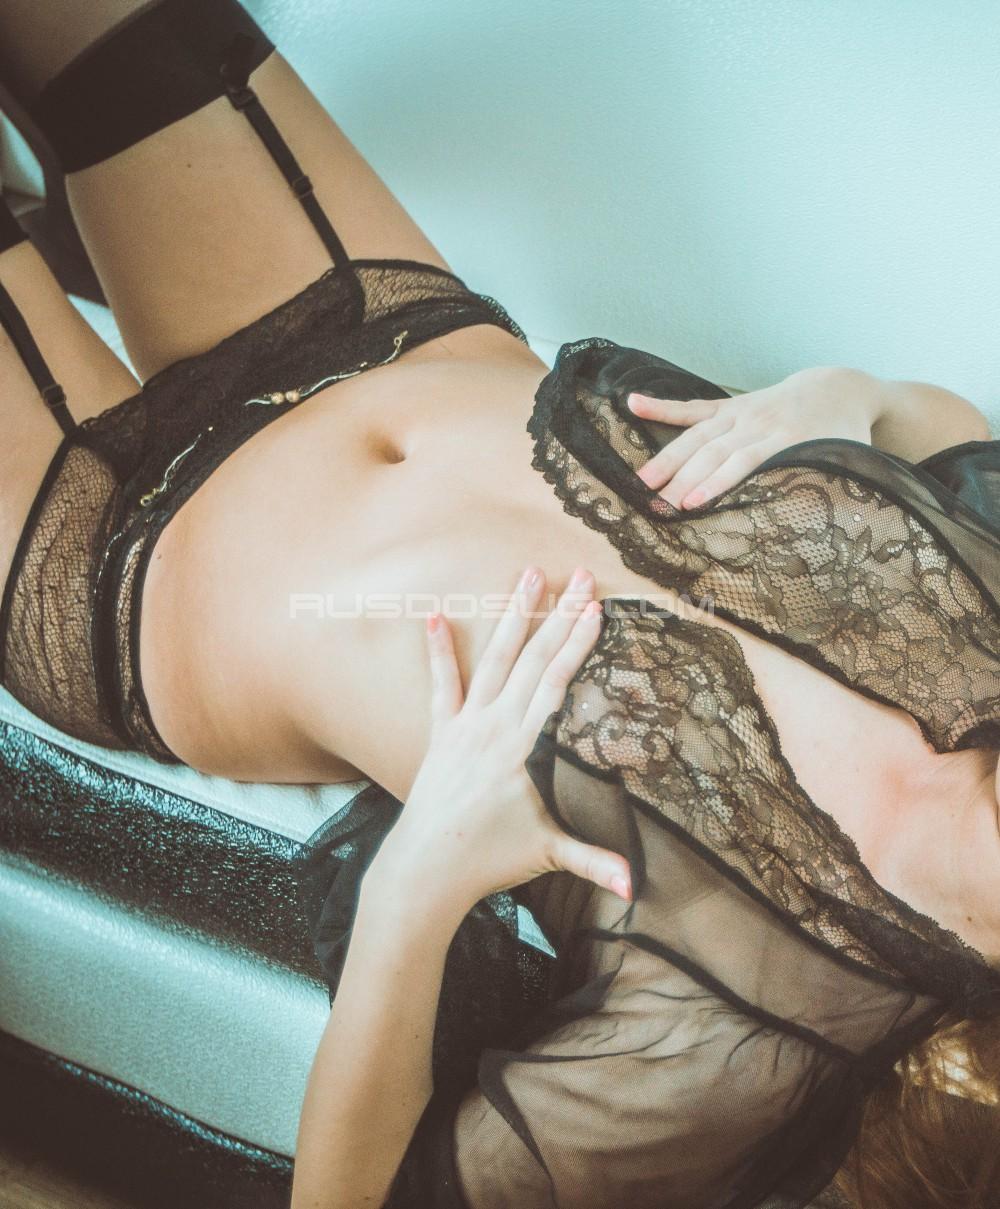 казань проститутки фото проверено